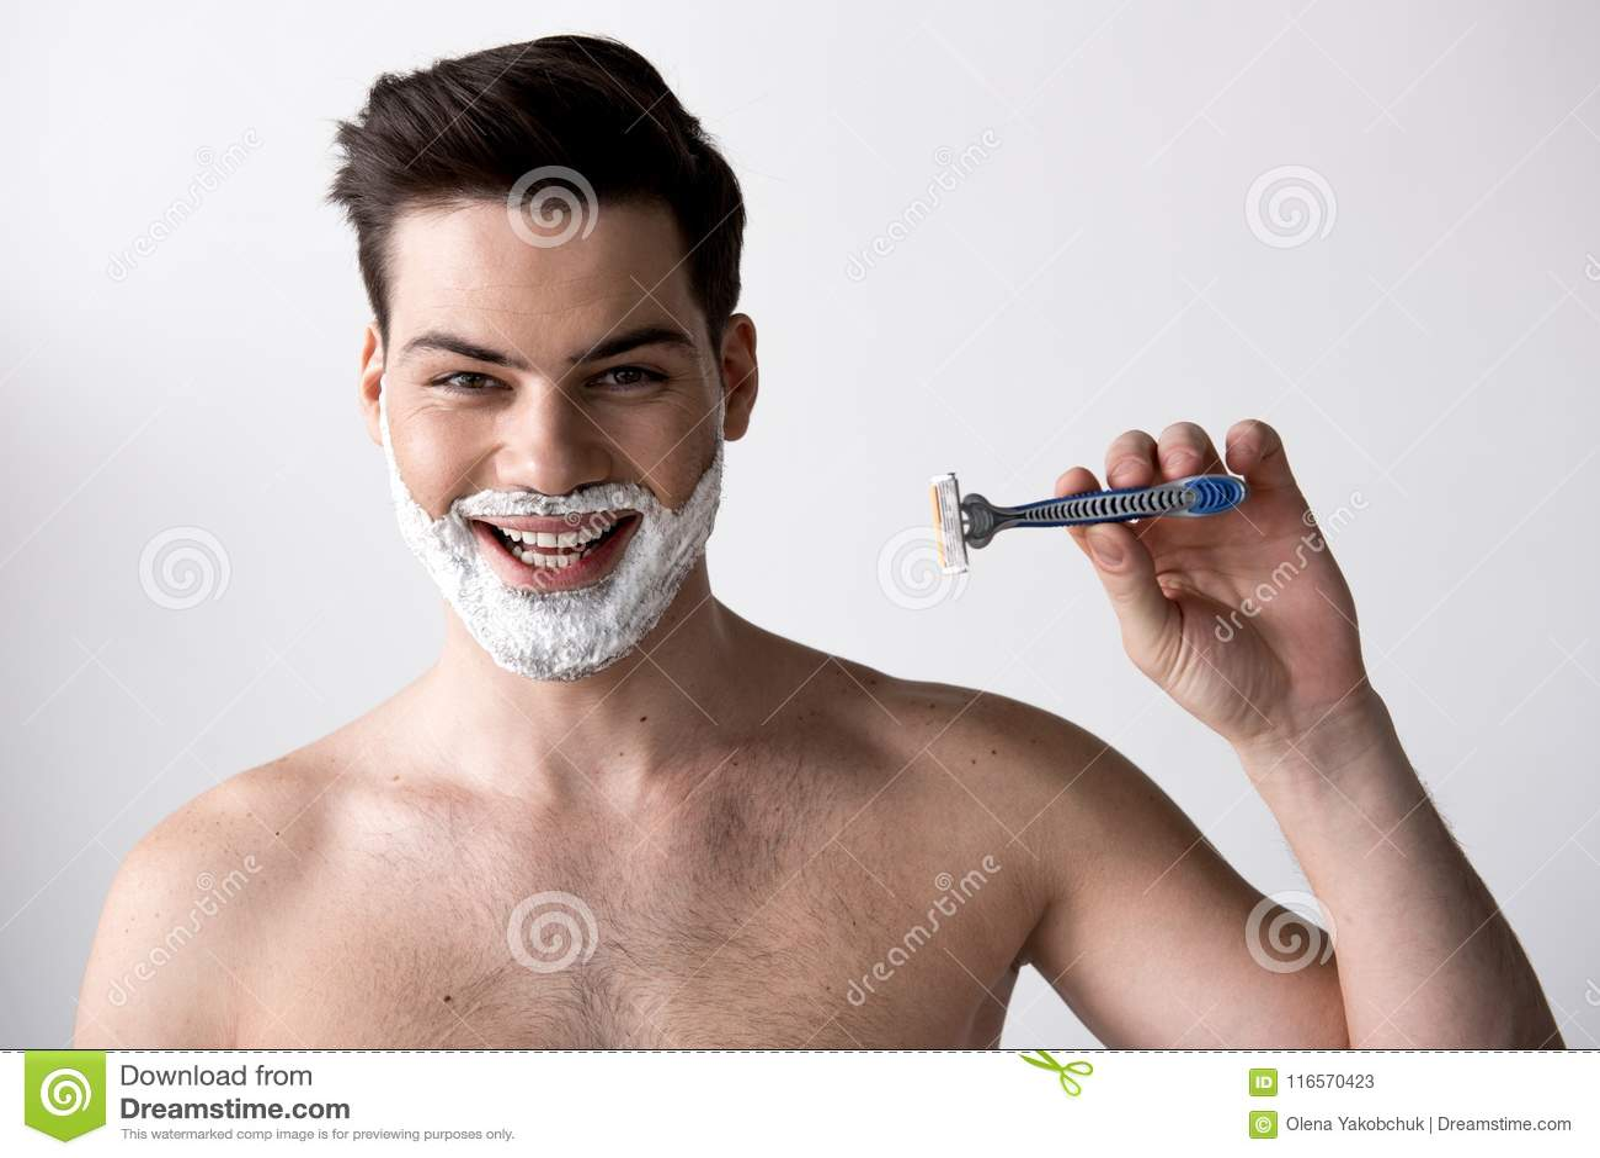 Joyful guy with shaving cream is expressing gladness